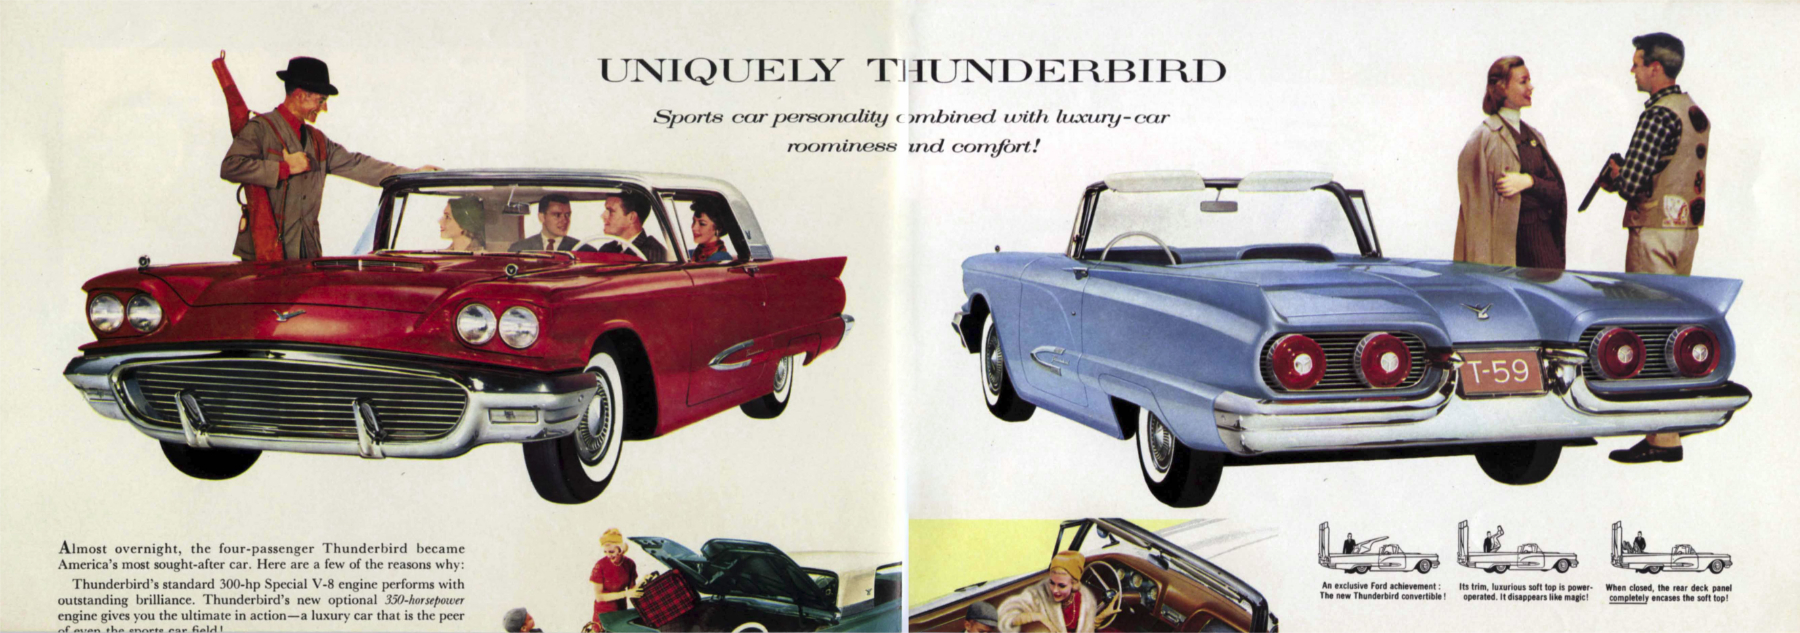 1959 Ford Thunderbird.jpg